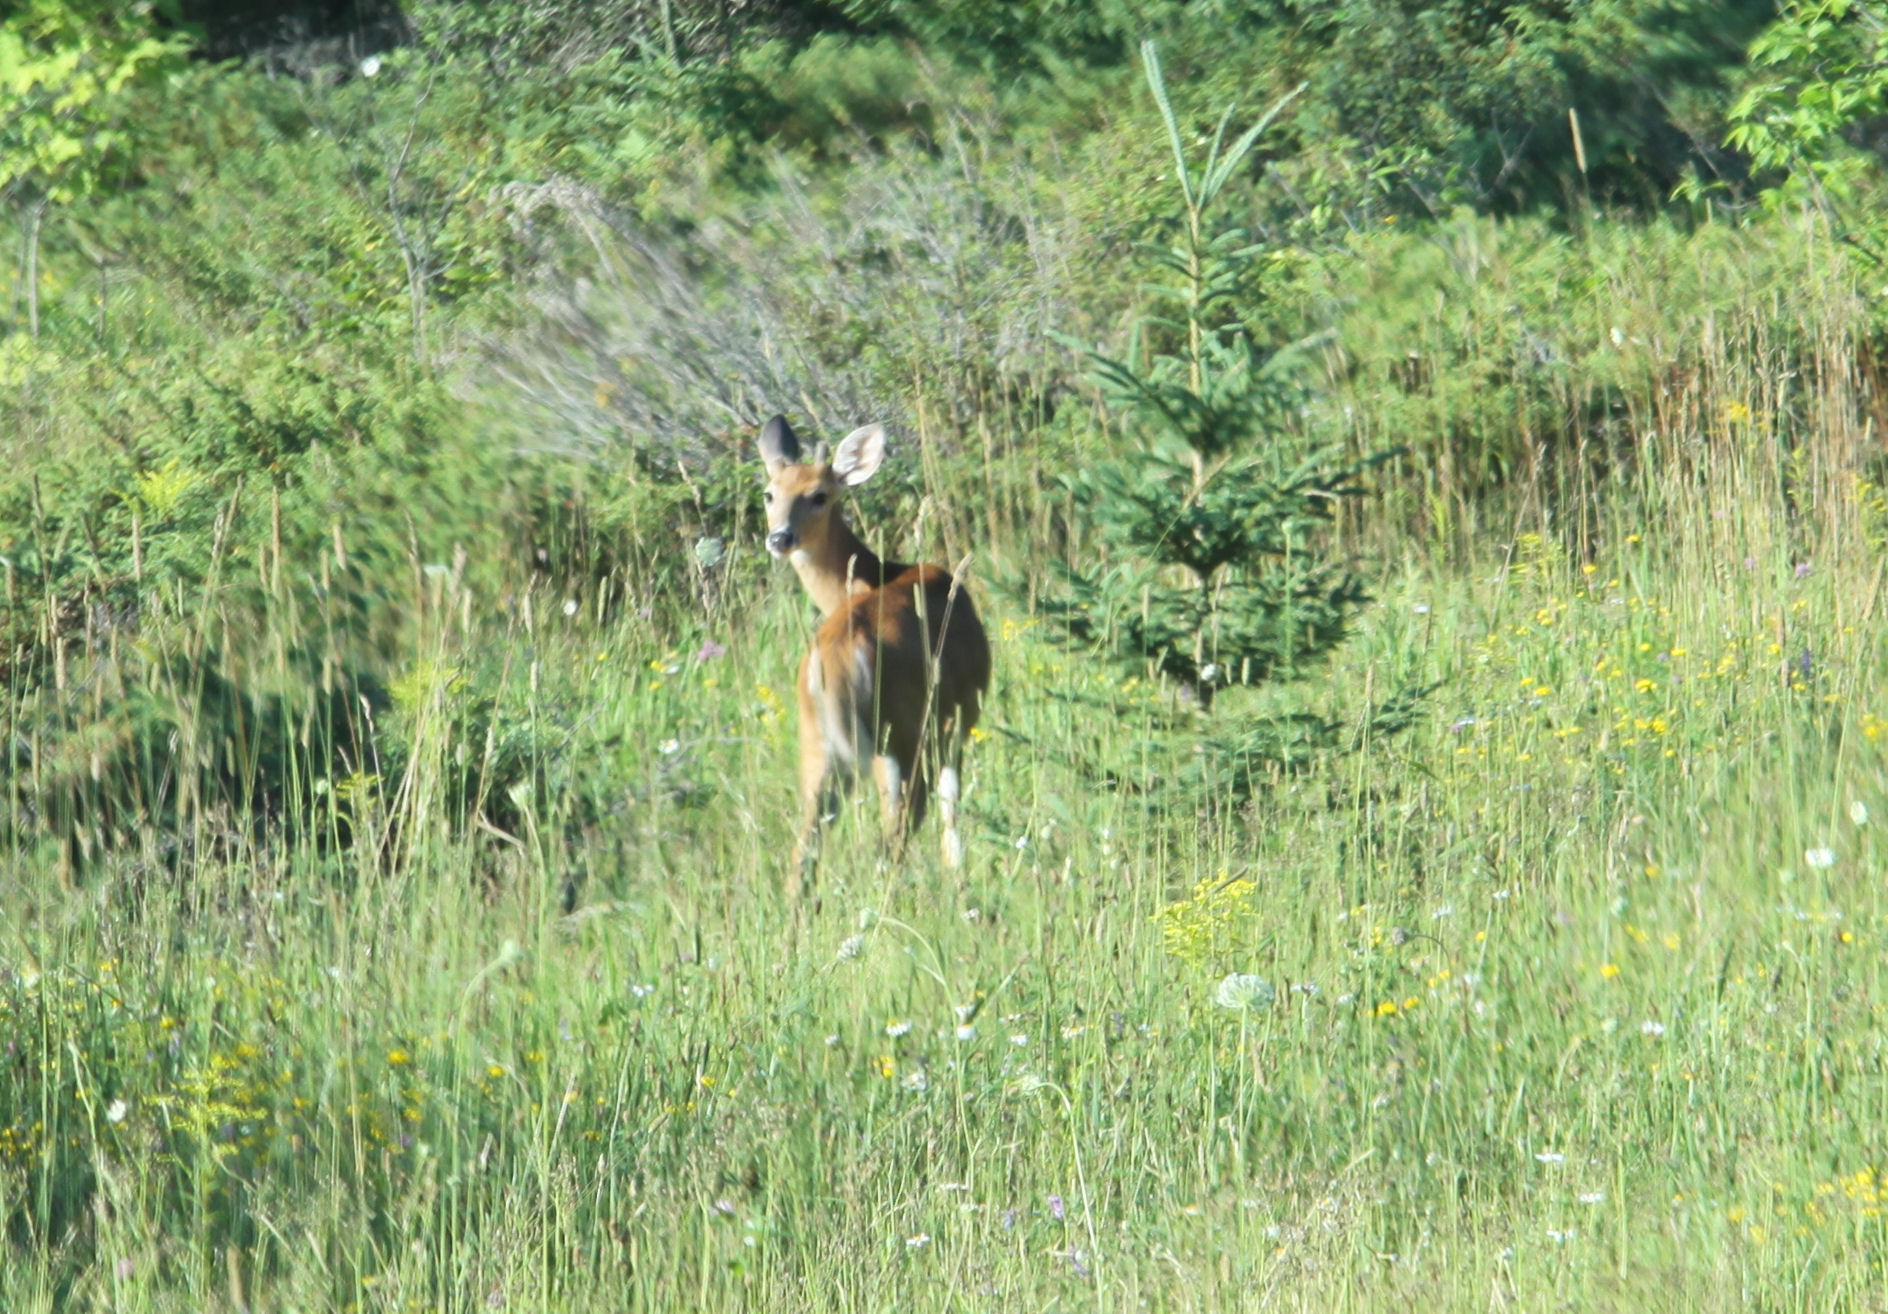 Deer along Hiking Trails at Gordon's Park on Manitoulin Island